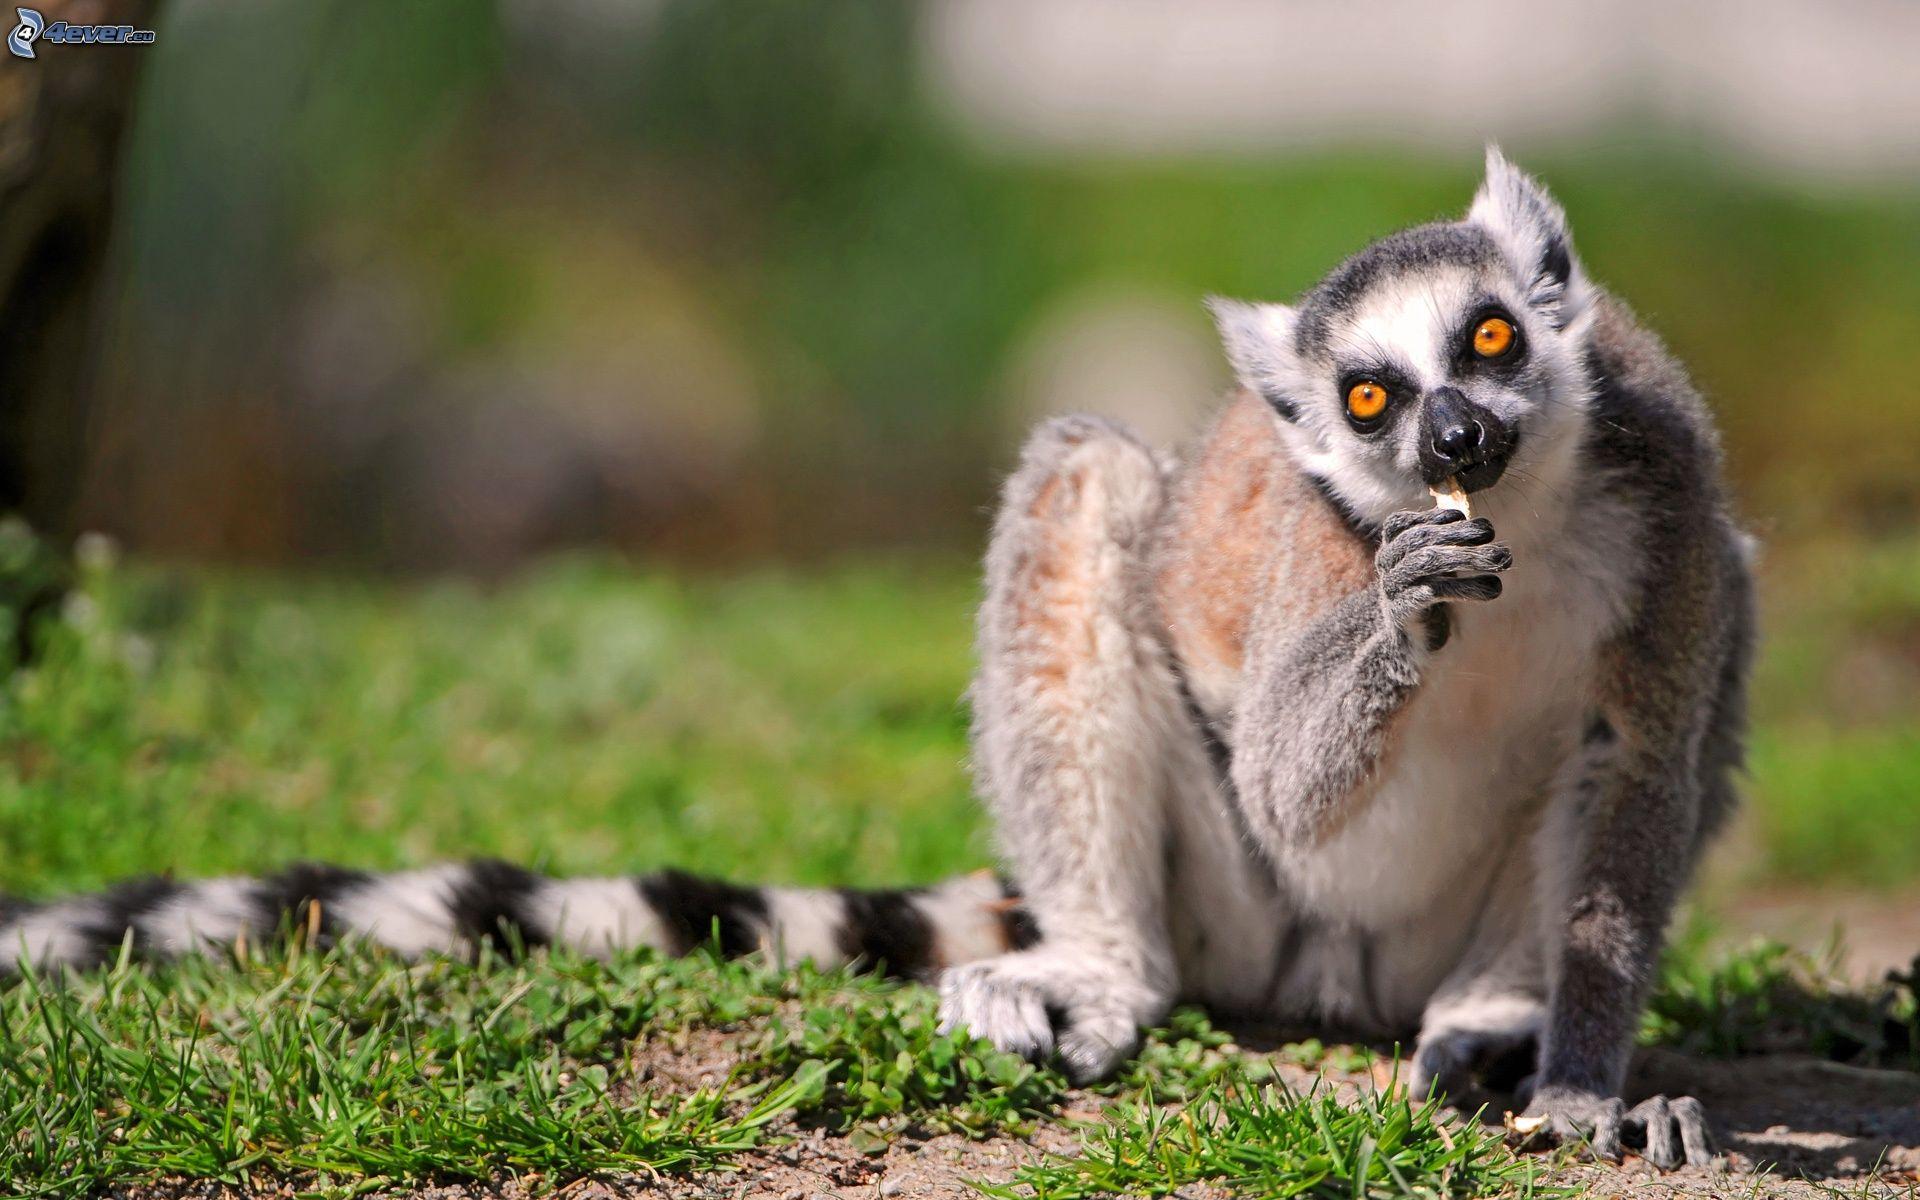 download wallpaper 3840x2160 lemur - photo #10